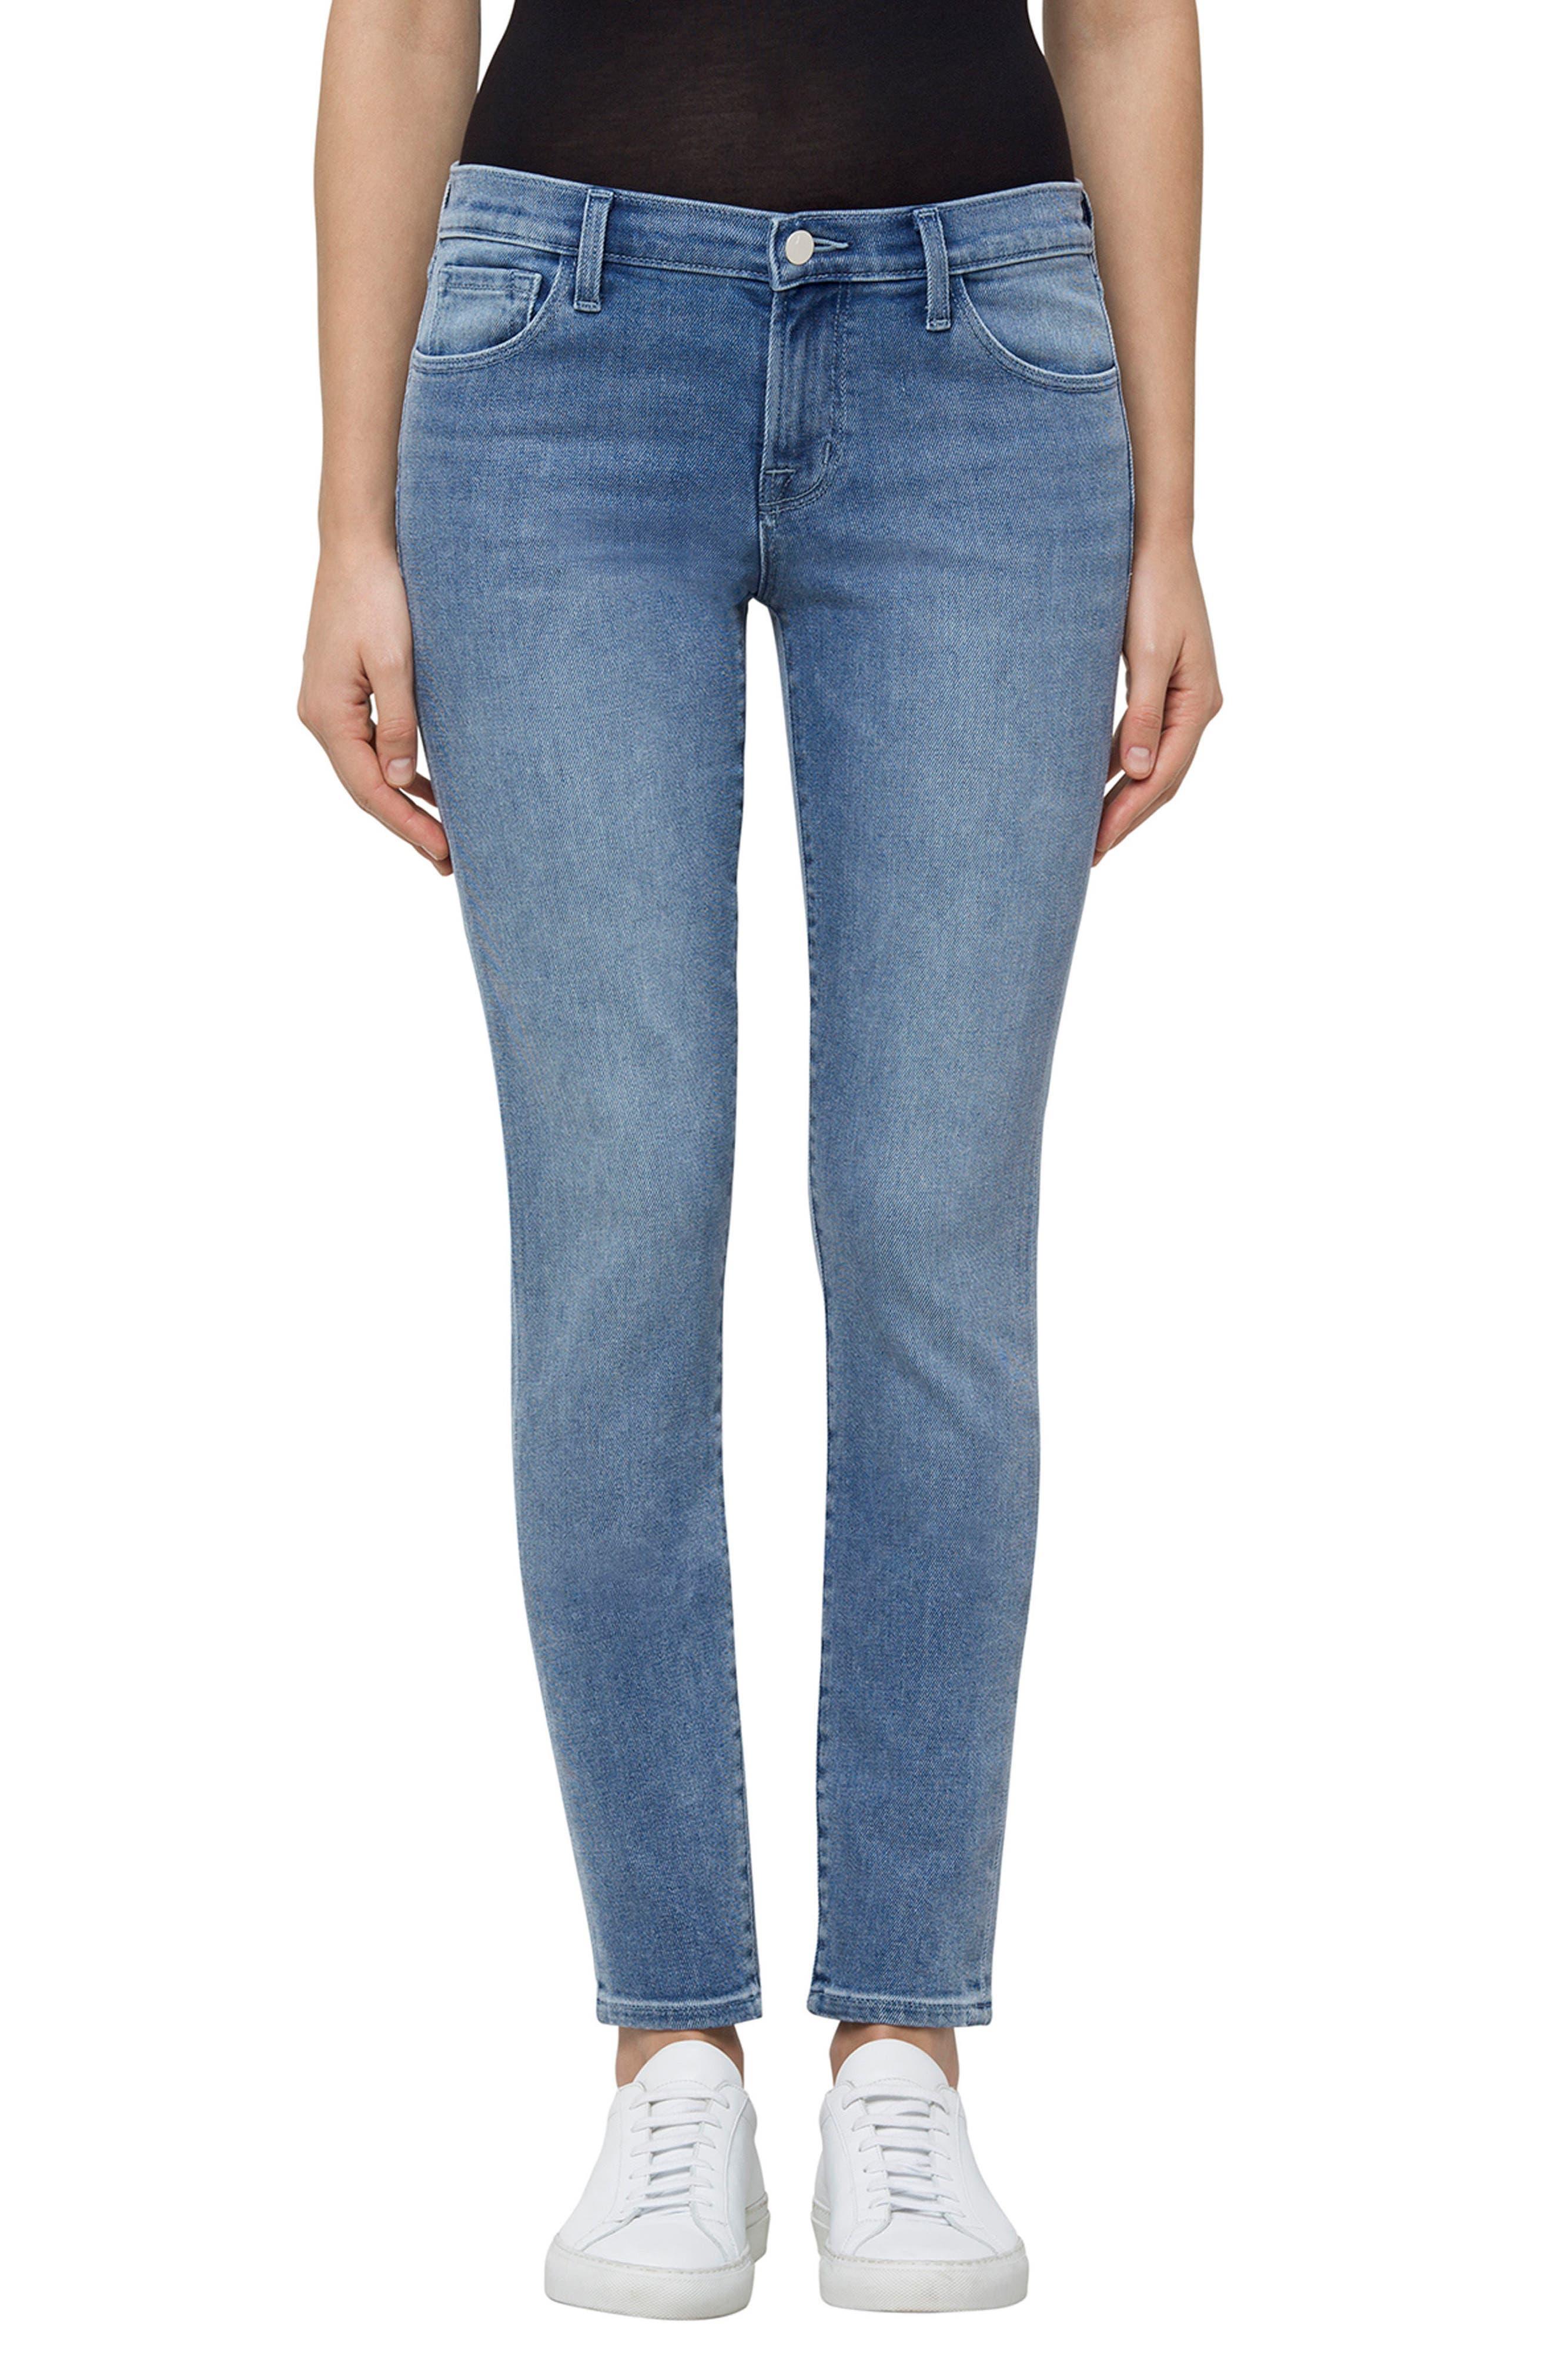 811 Skinny Jeans,                             Main thumbnail 1, color,                             Utopia